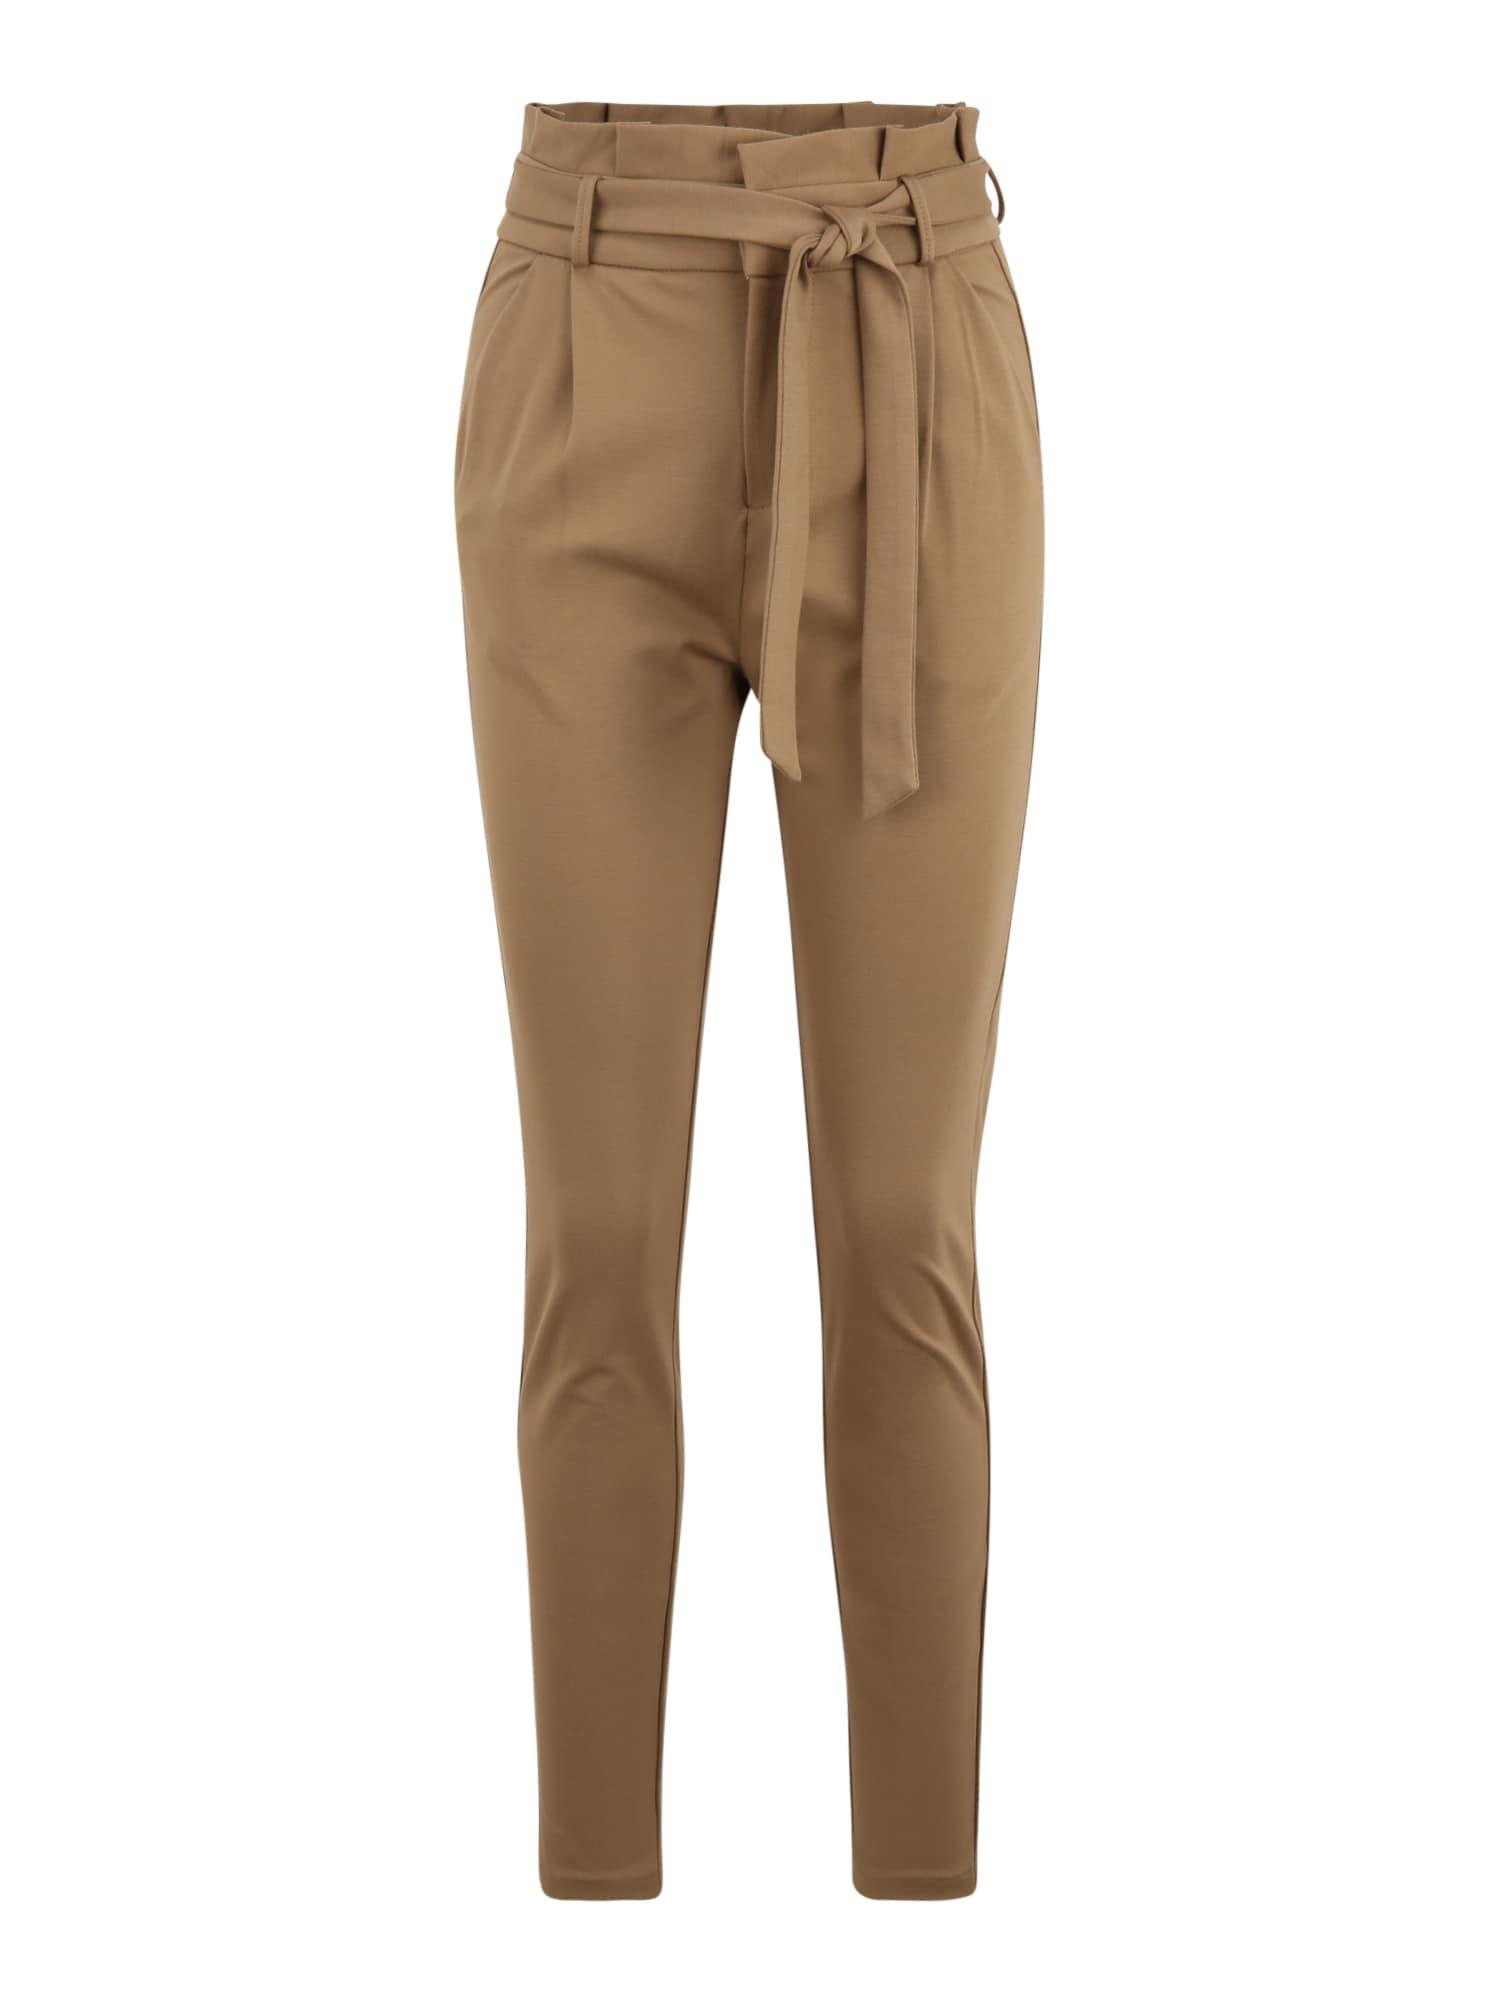 Vero Moda Tall Pantalon à pince 'Eva'  - Marron - Taille: M - female